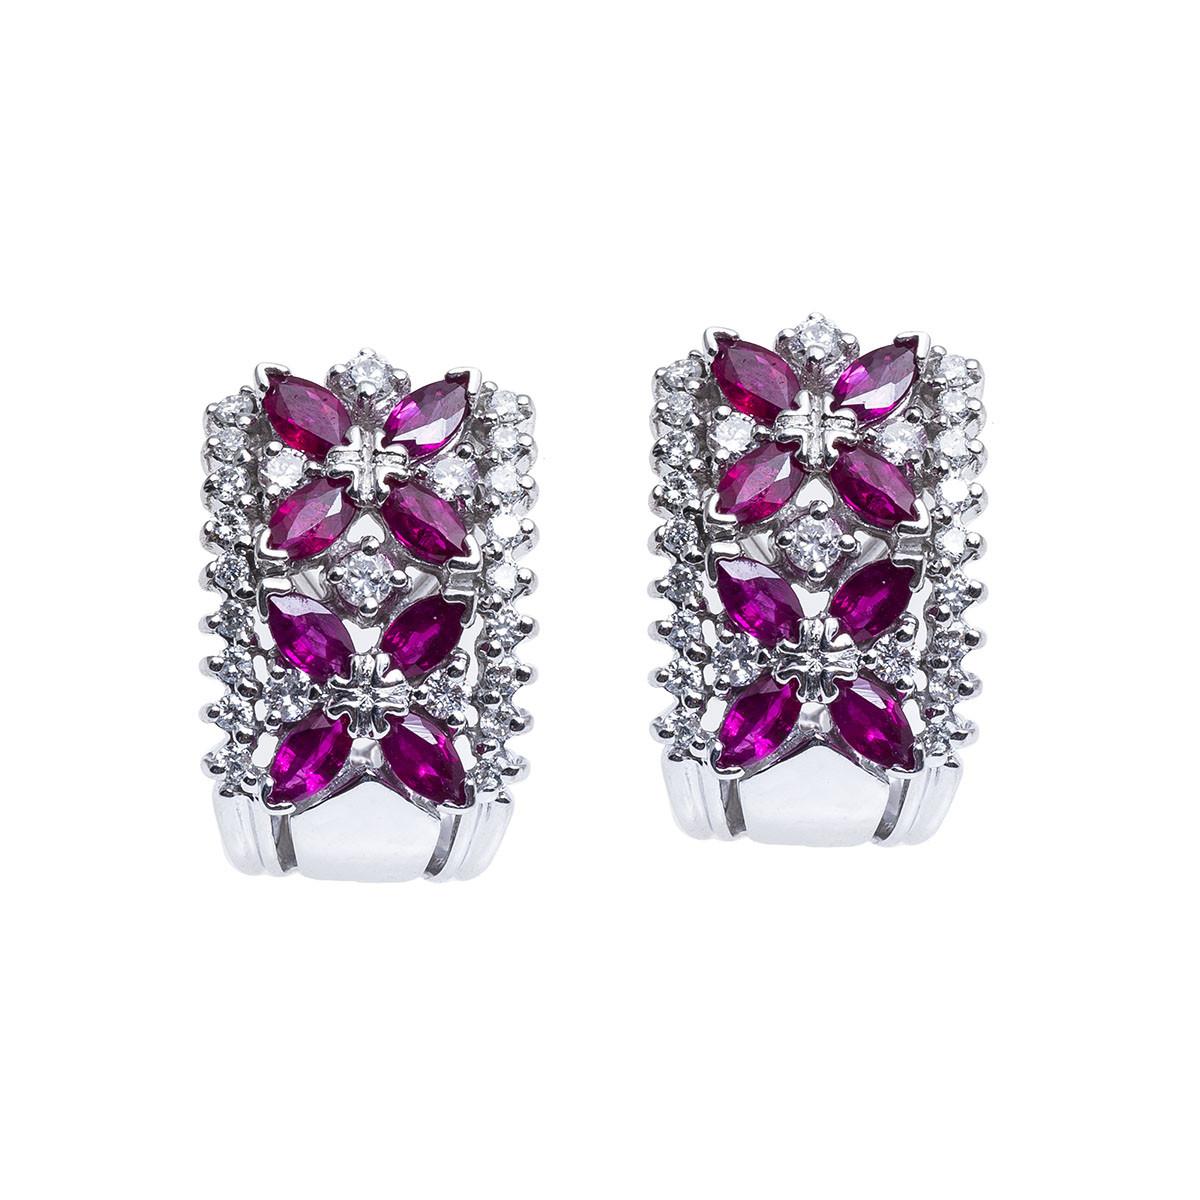 Vintage 1.40 CTW Diamond & Ruby Flower Earrings